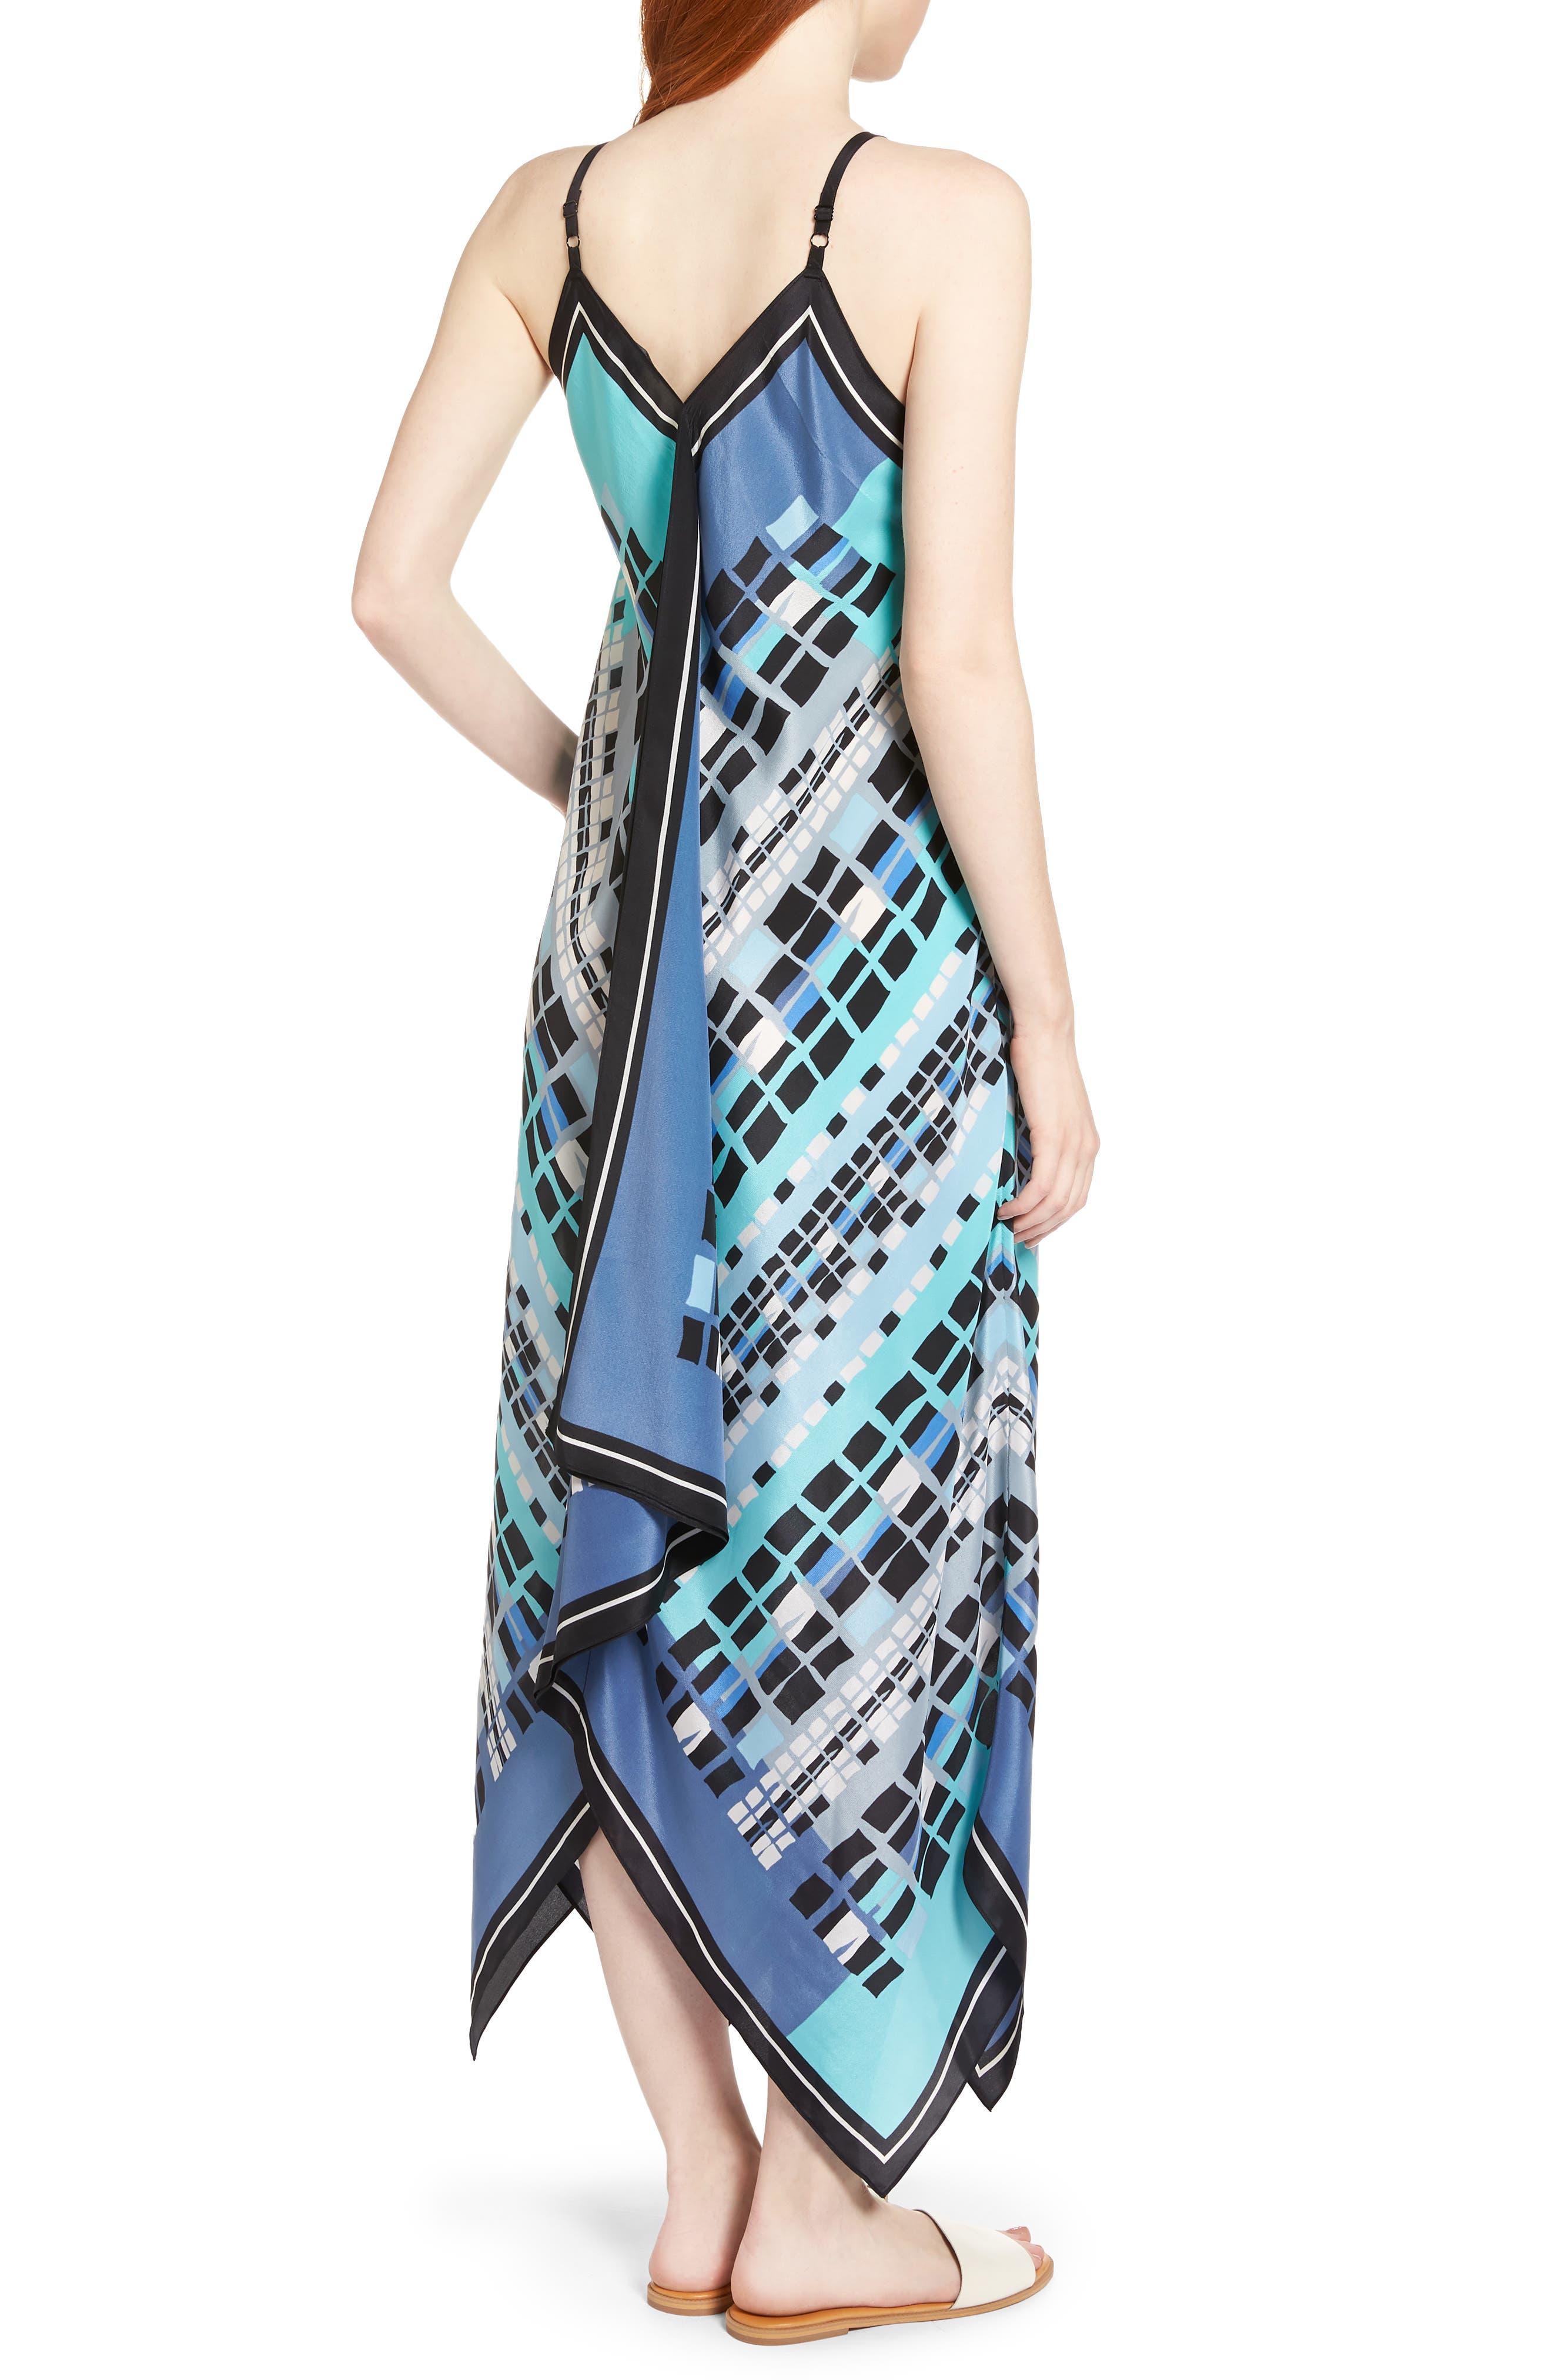 From Above Dress Silk Blend Maxi Dress,                             Alternate thumbnail 2, color,                             490